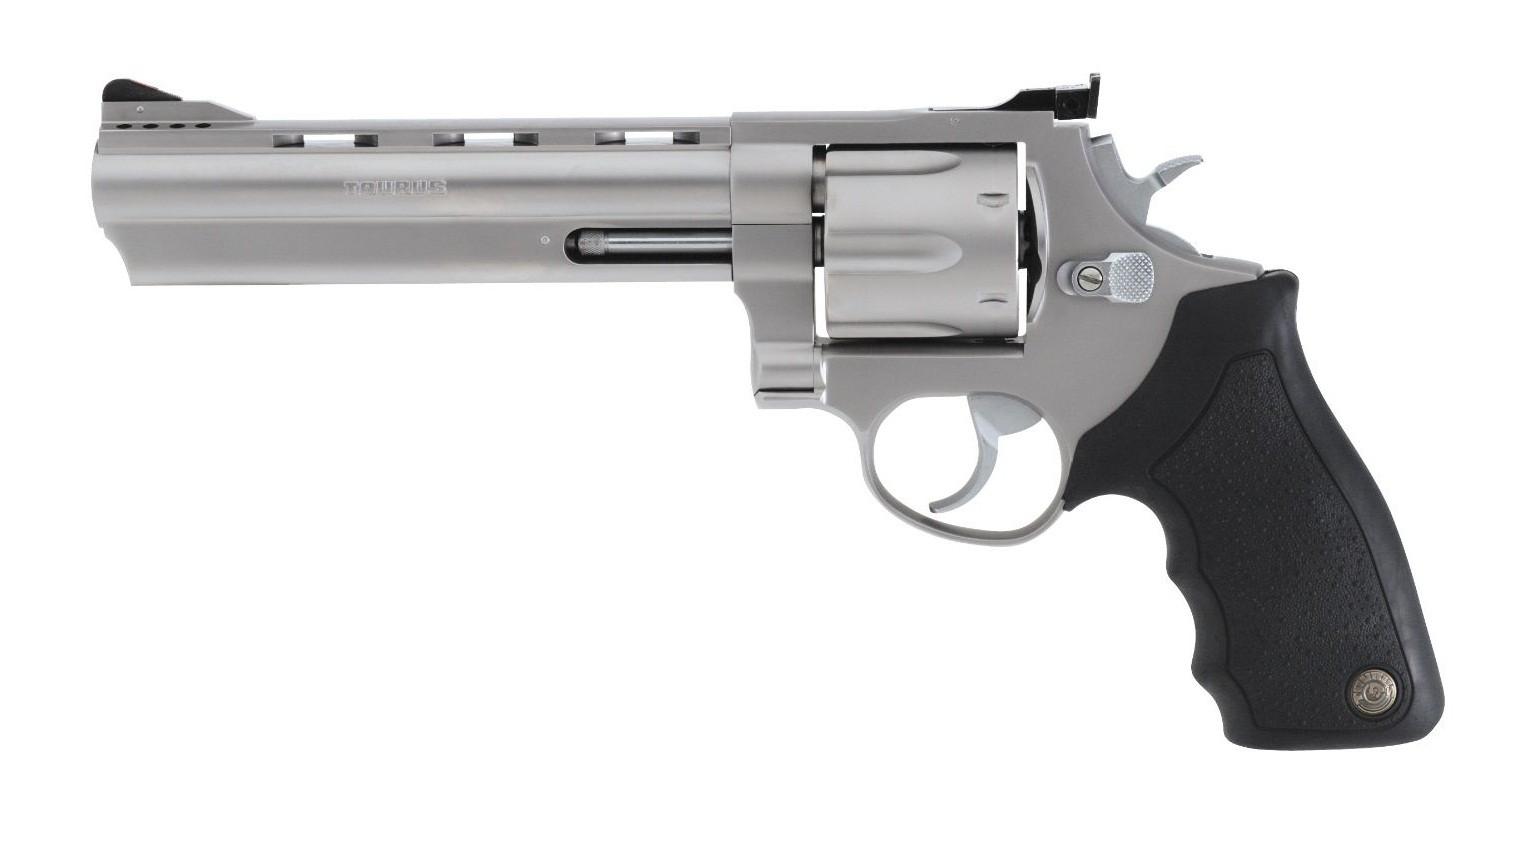 Drawn pistol 44 magnum 44 Gun Taurus Taurus 44